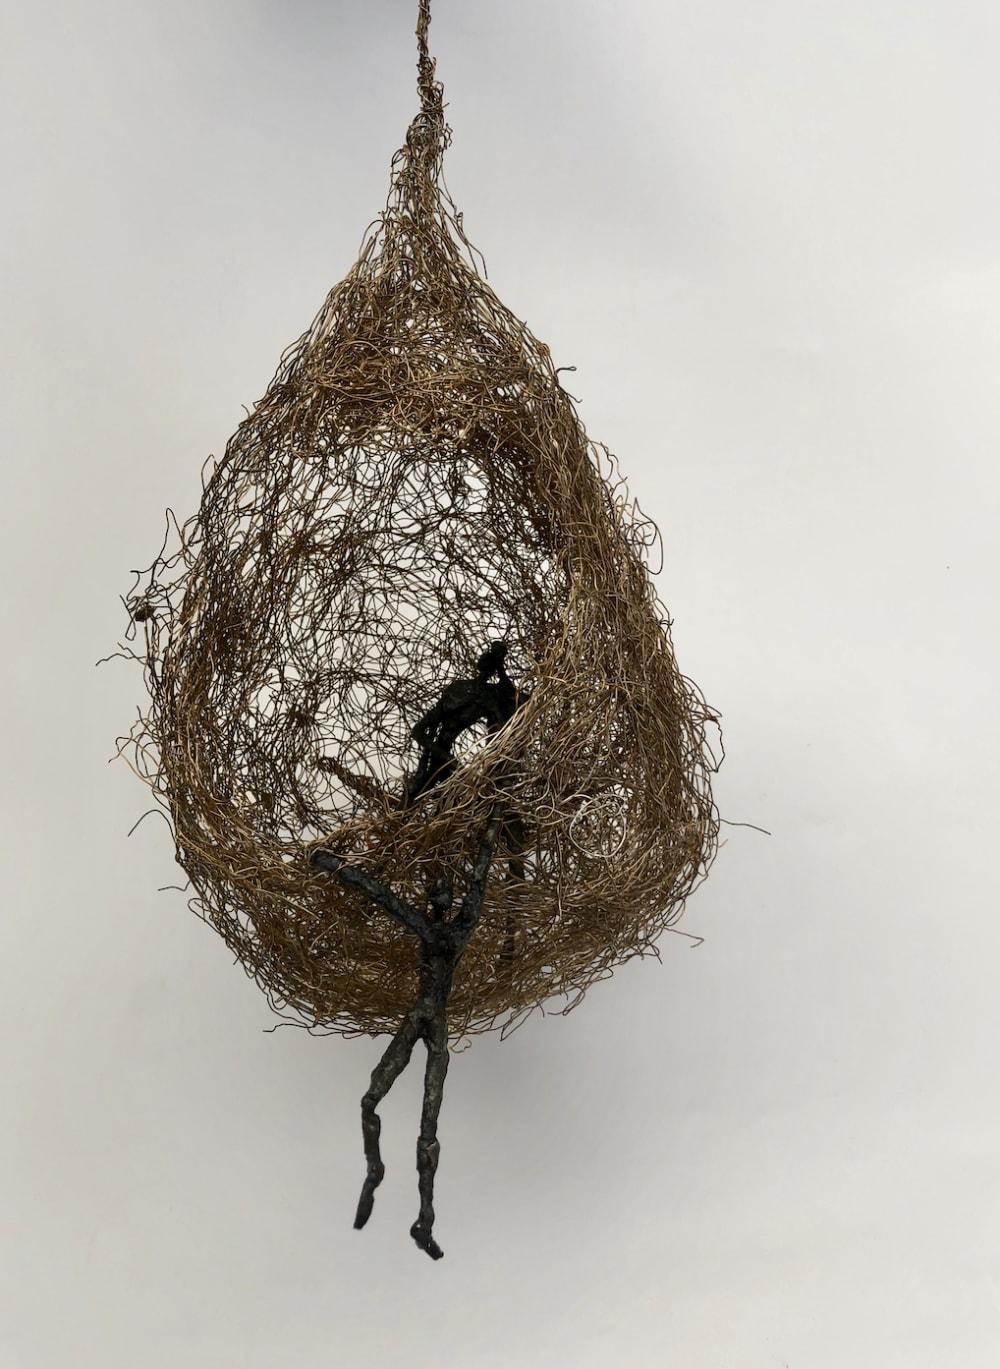 Mobile - Tombé du nid - Juliette  Meynial